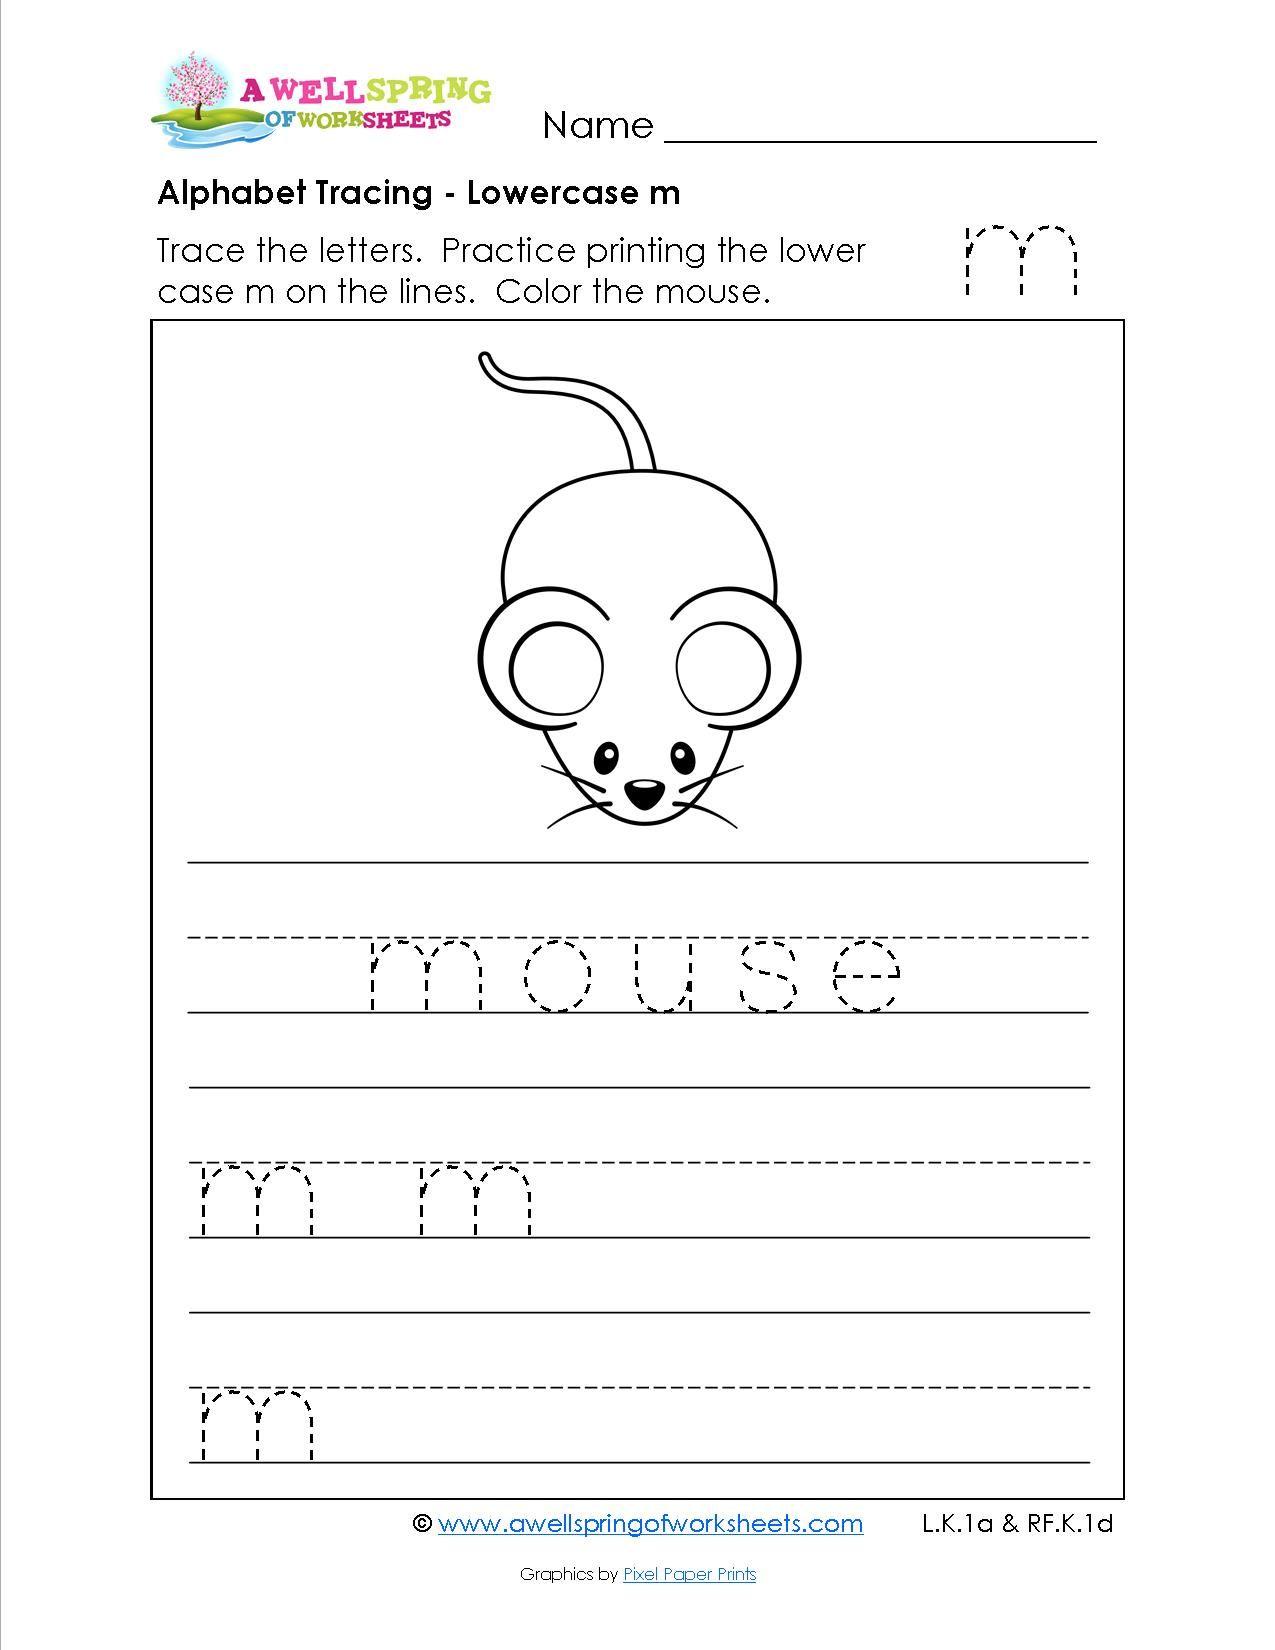 Grade Level Worksheets | Worksheets, Pre-school and Social studies